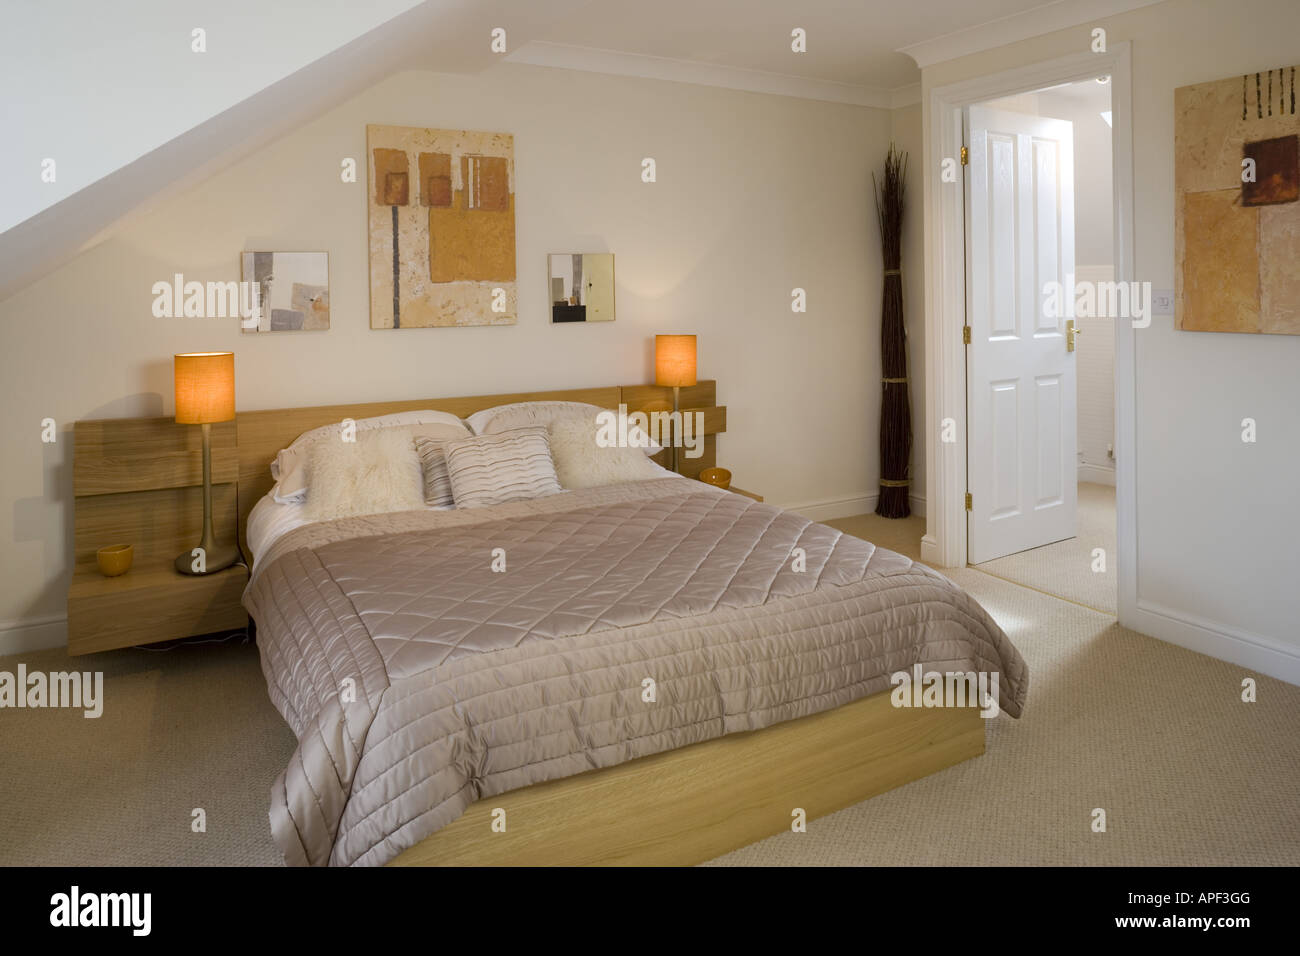 Mews Style Houses, Misterton and Retford, Nottinghamshire Architect: Spawforth Associates Stock Photo